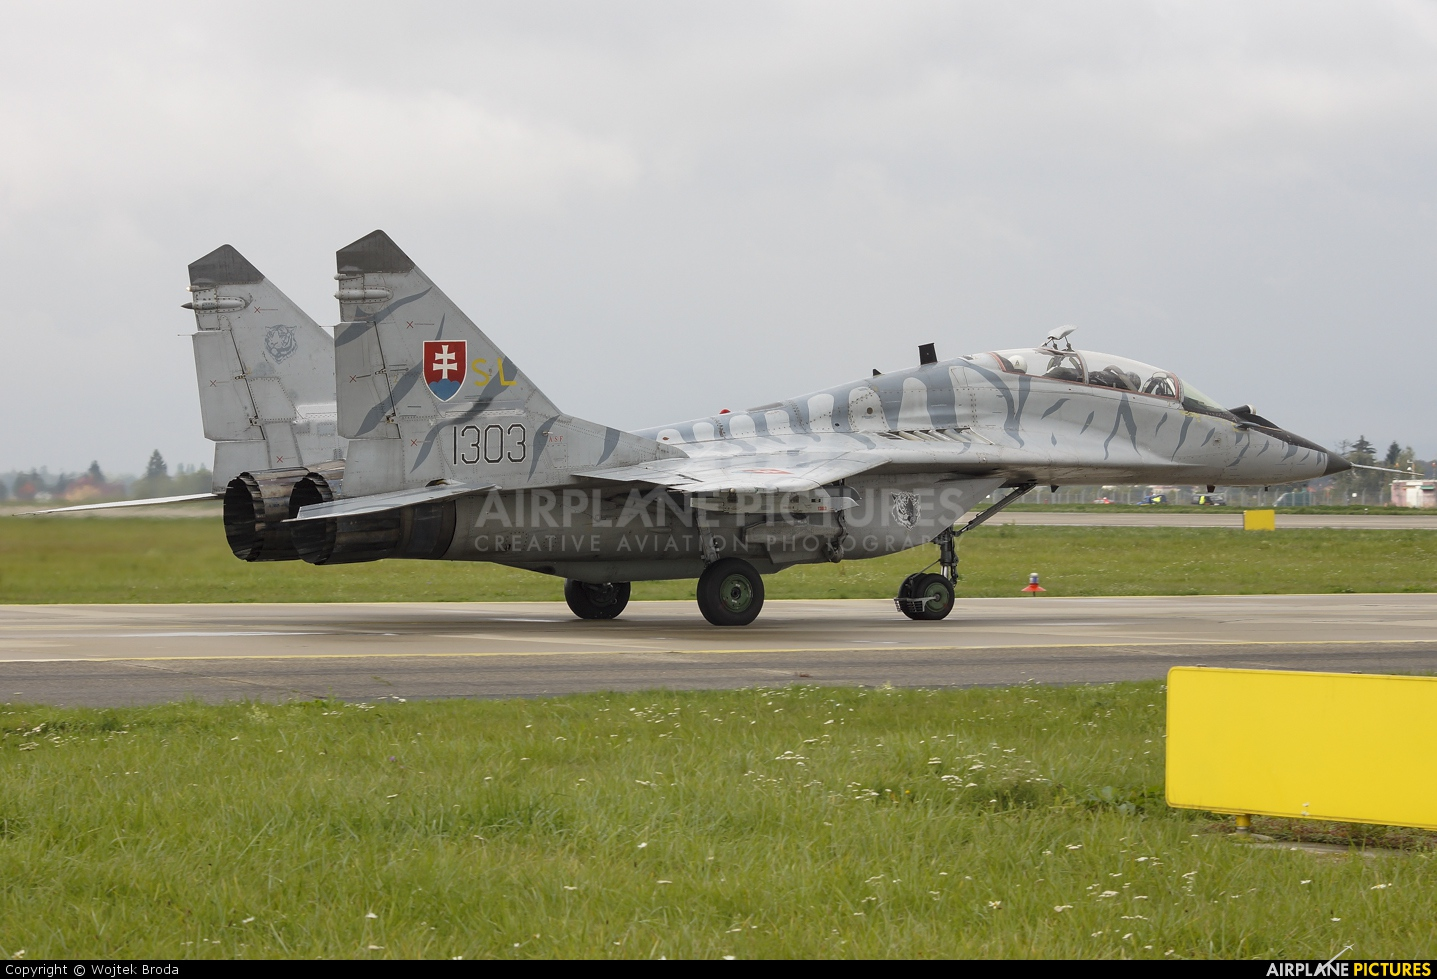 Slovakia -  Air Force 1303 aircraft at Ostrava Mošnov